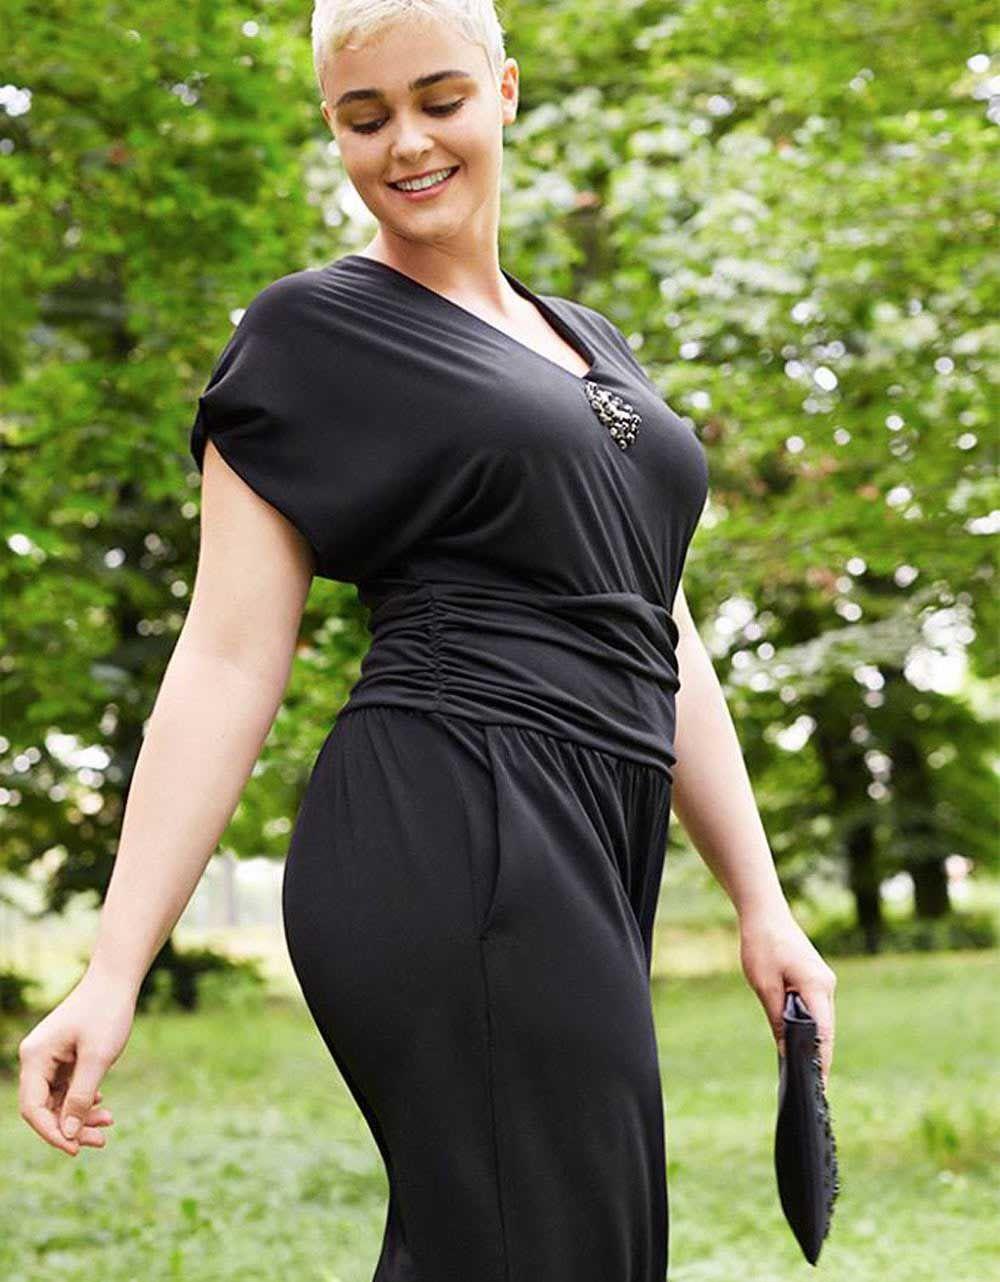 1a57b54bcf0 Fiorella Rubino модная одежда больших размеров. Италия